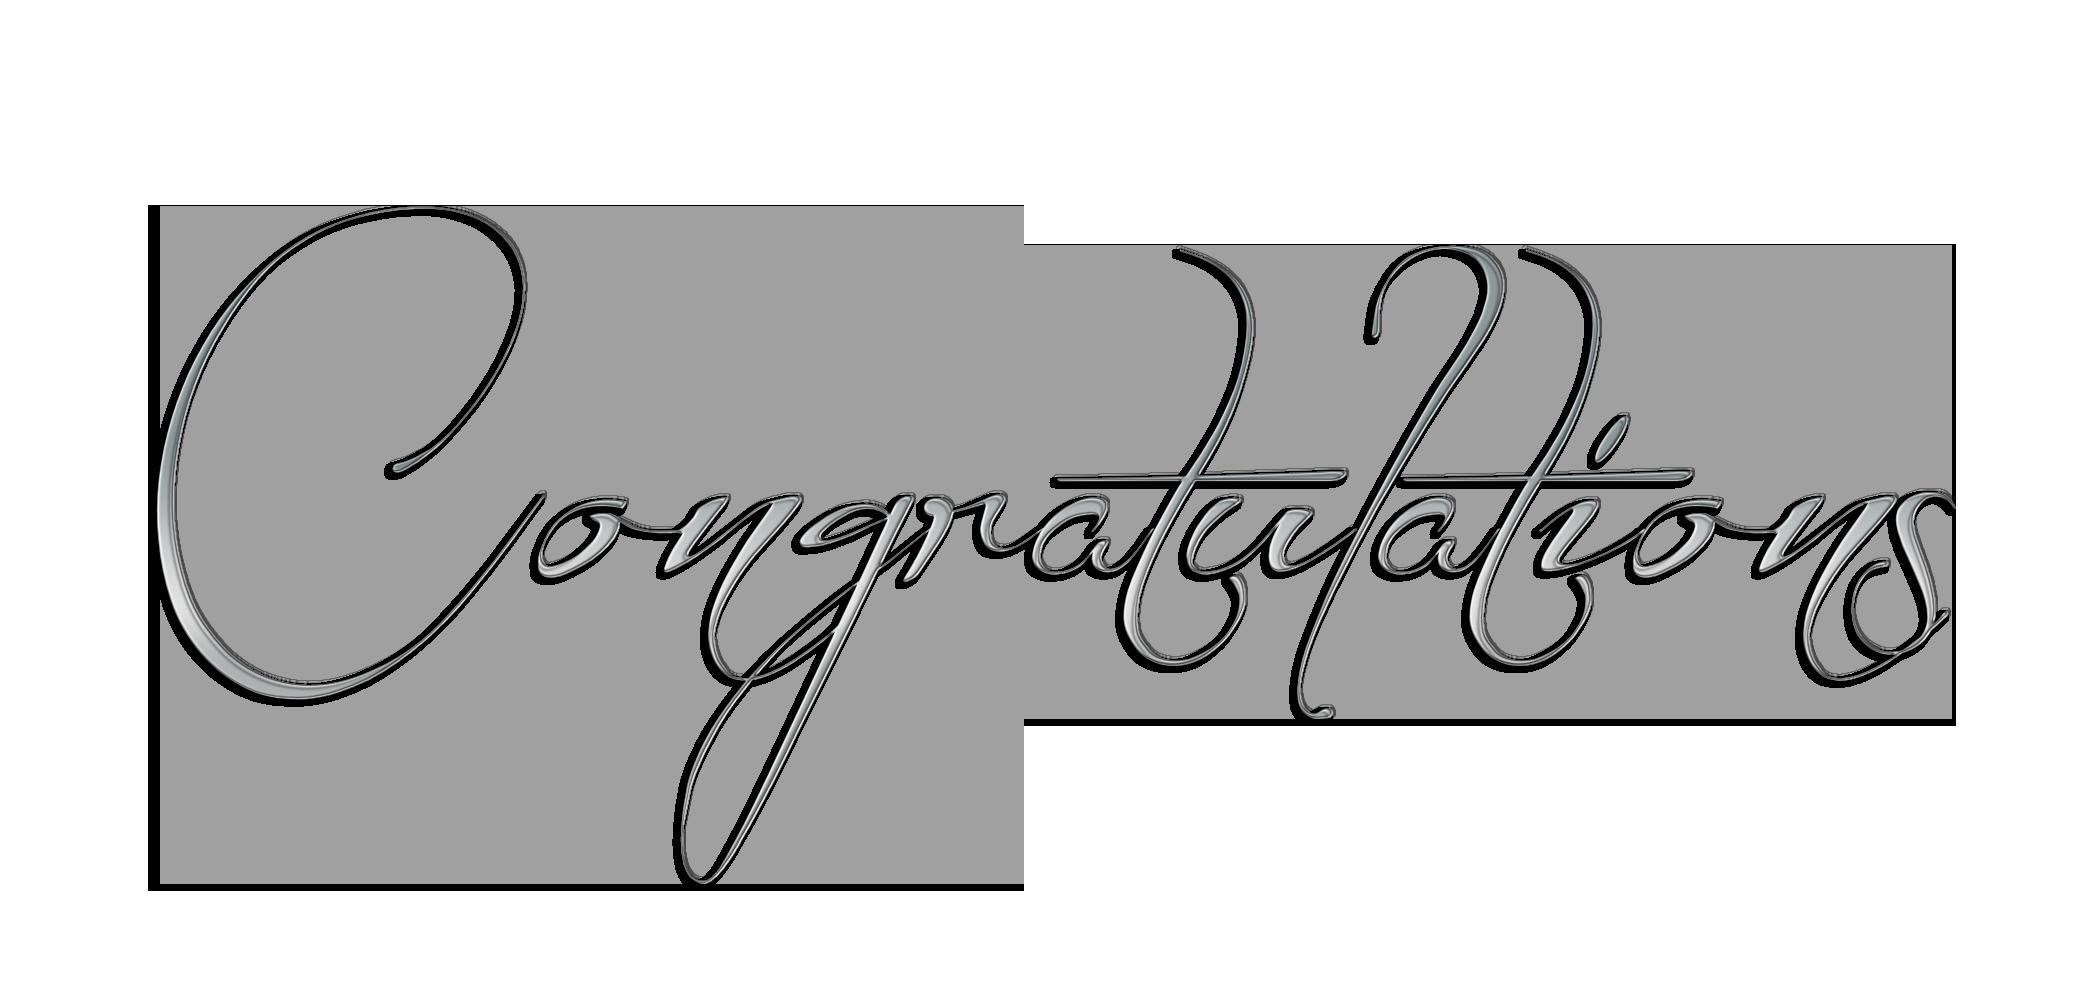 Http weddingcountdownblog blogspot com. Congratulations clipart congratulation class 2016